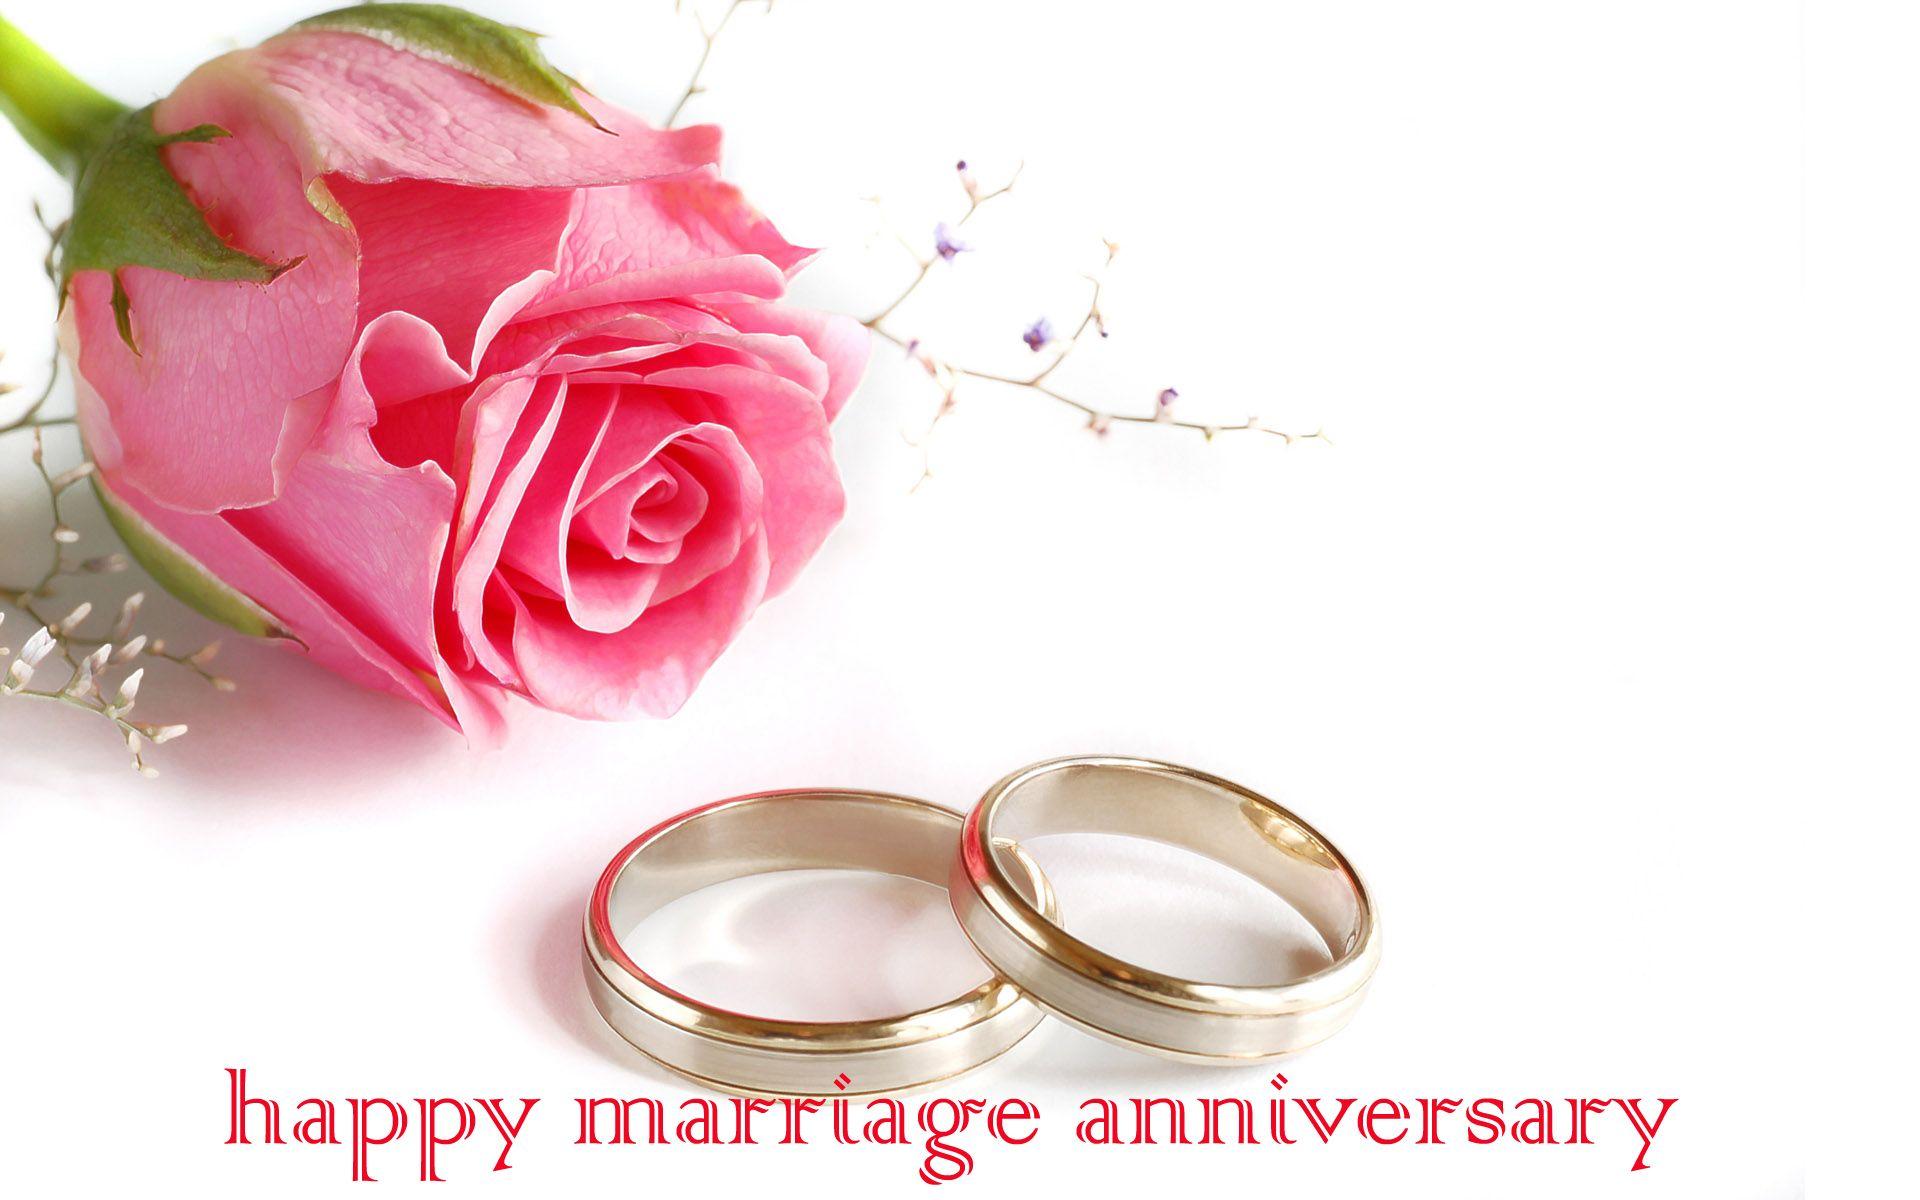 Wedding anniversary greetings for wife husband or couple happy wedding anniversary greetings for wife husband or couple kristyandbryce Image collections